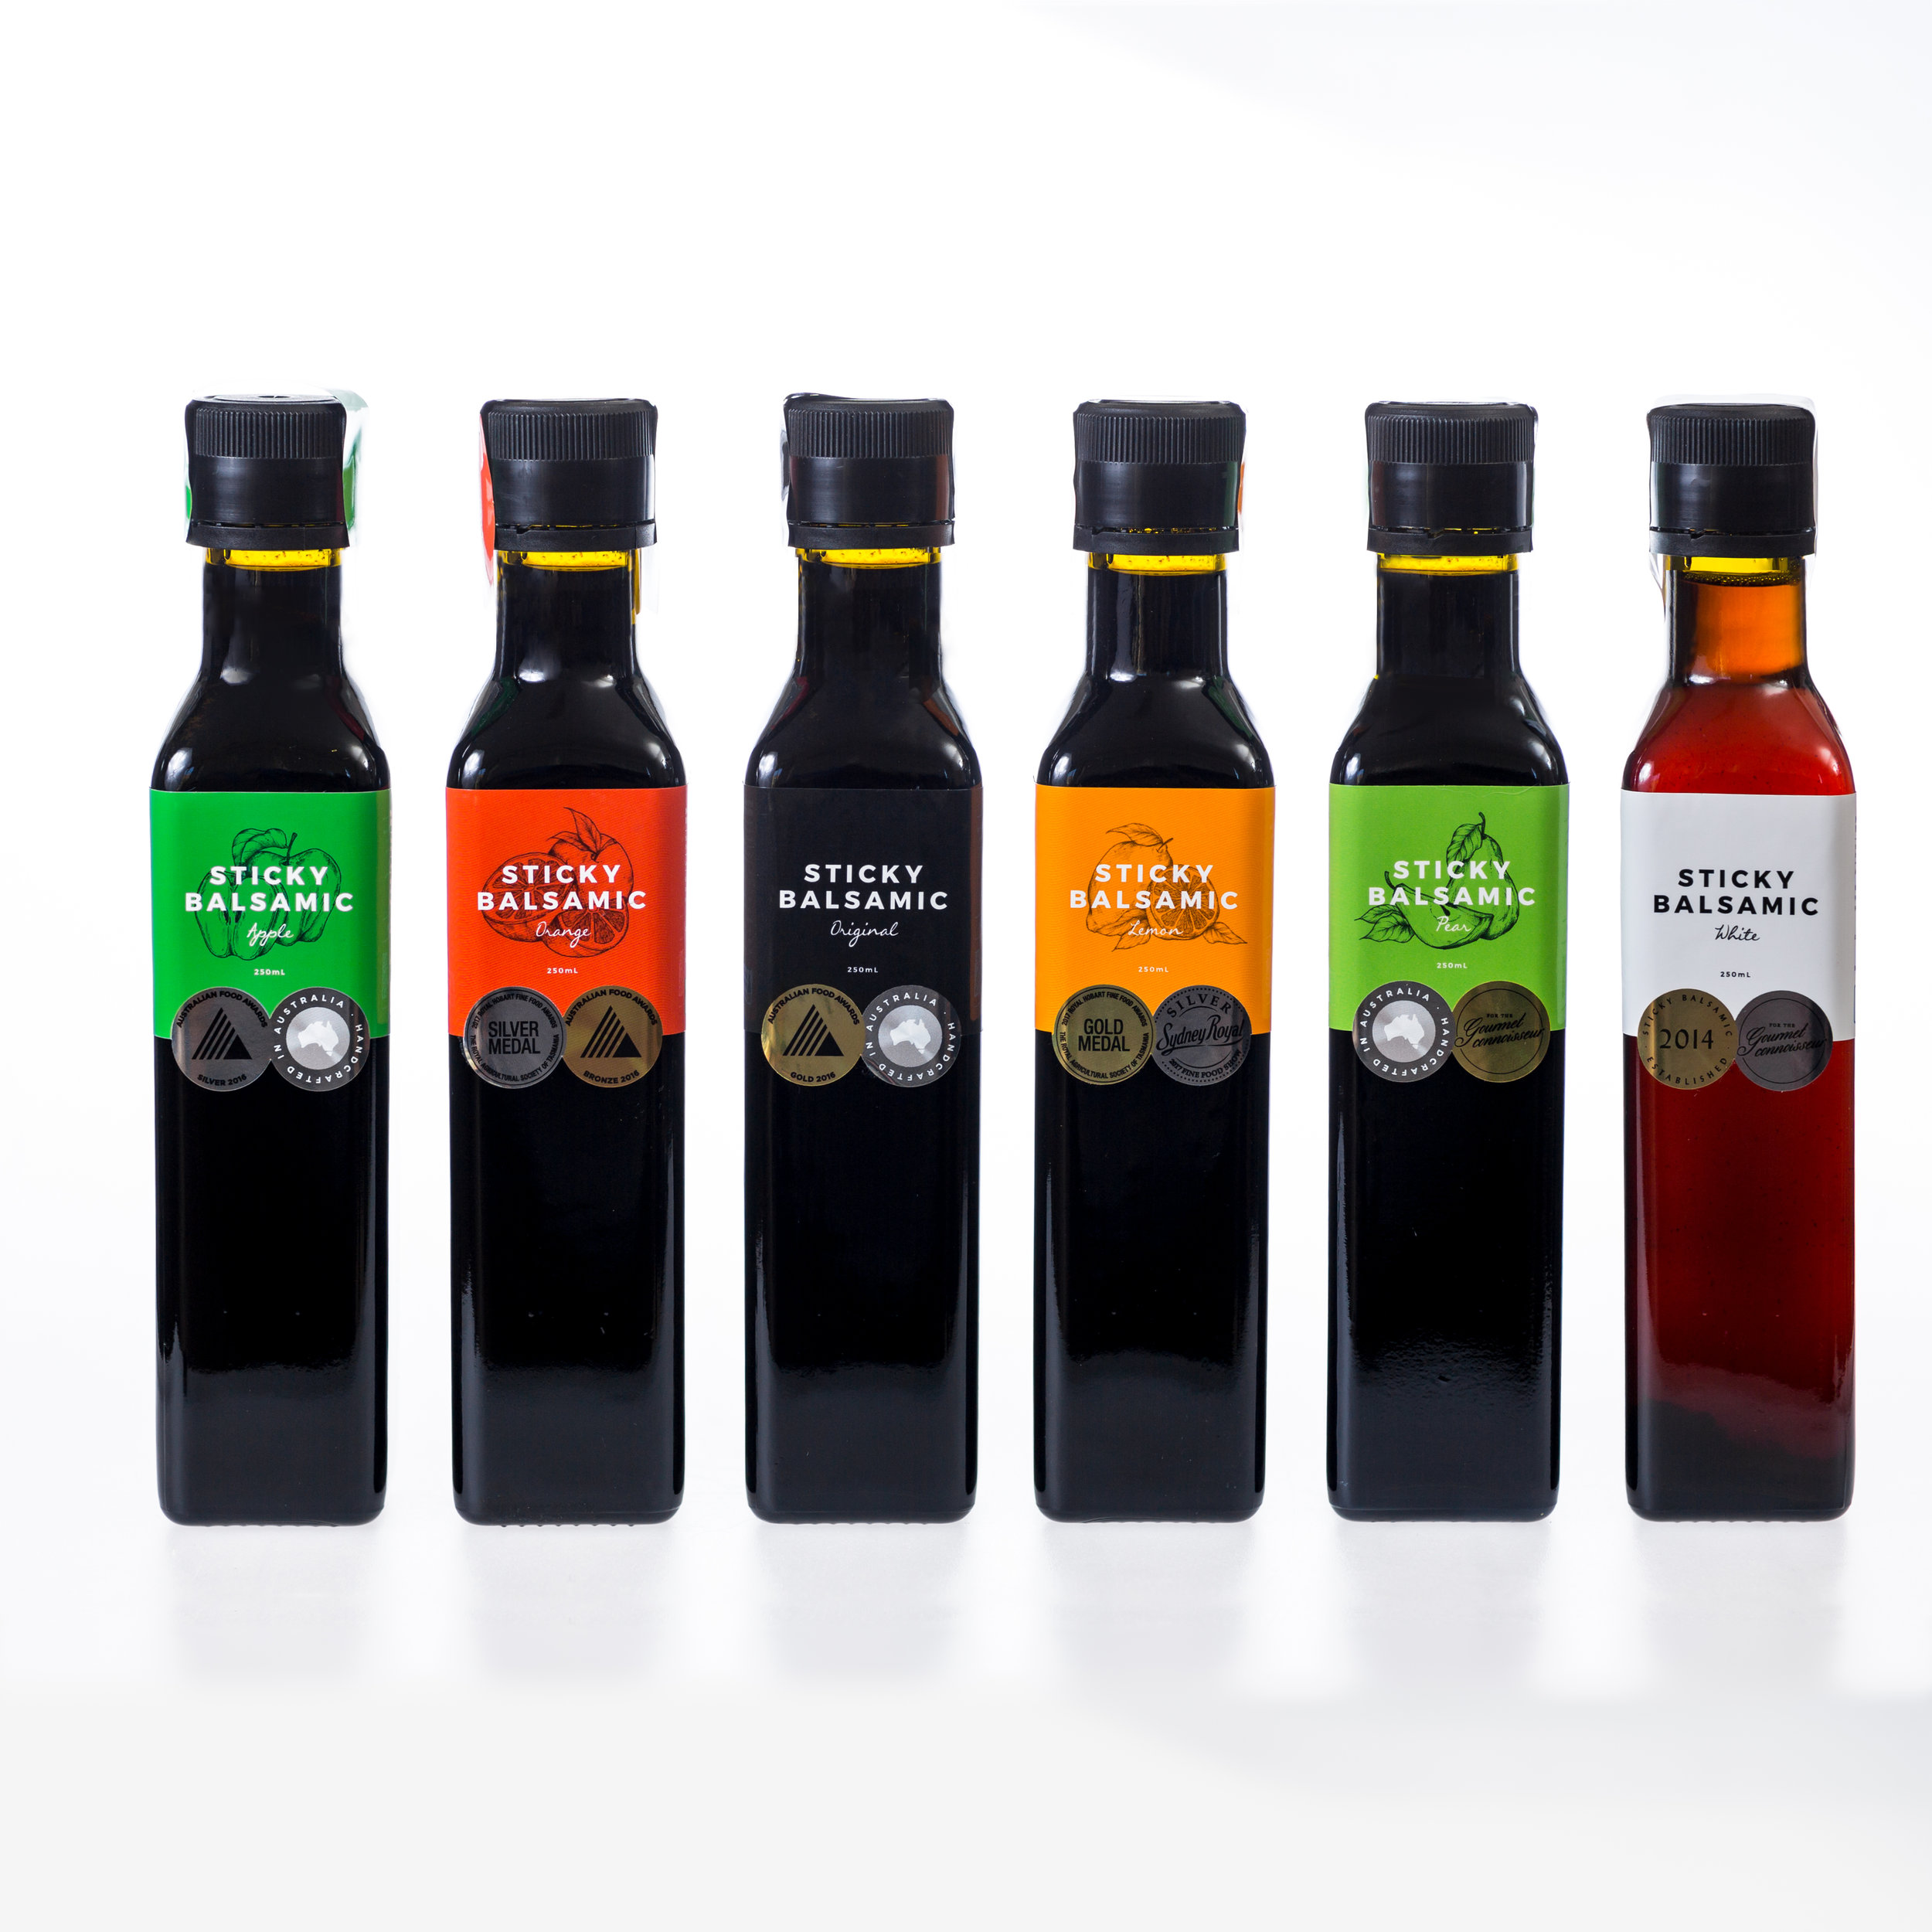 Sticky Balsamic Original Range